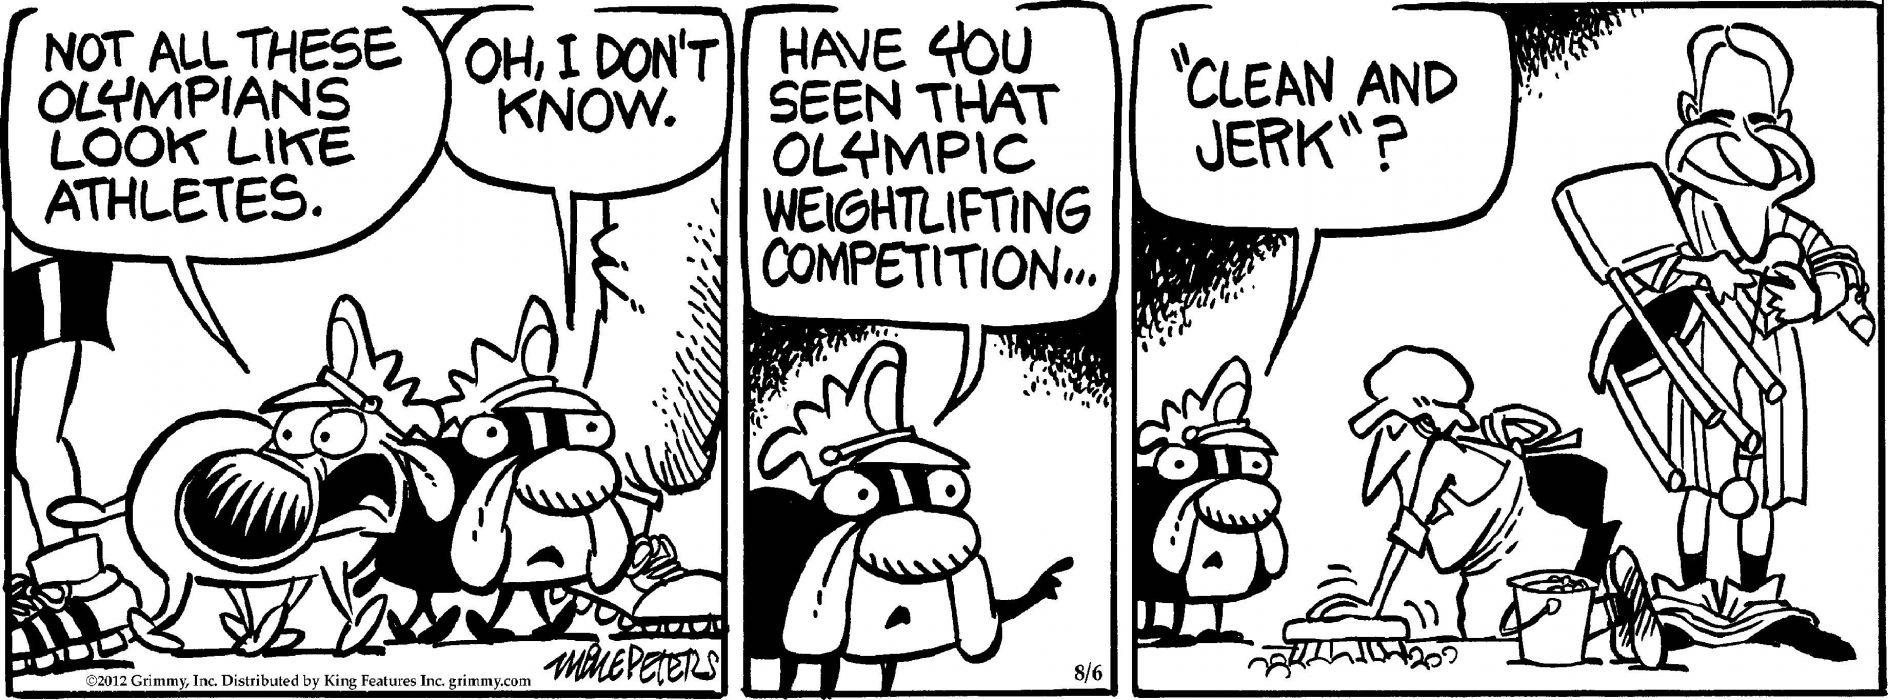 MOTHER-GOOSE-AND-GRIM mother goose grim funny humor comicstrip (12) wallpaper